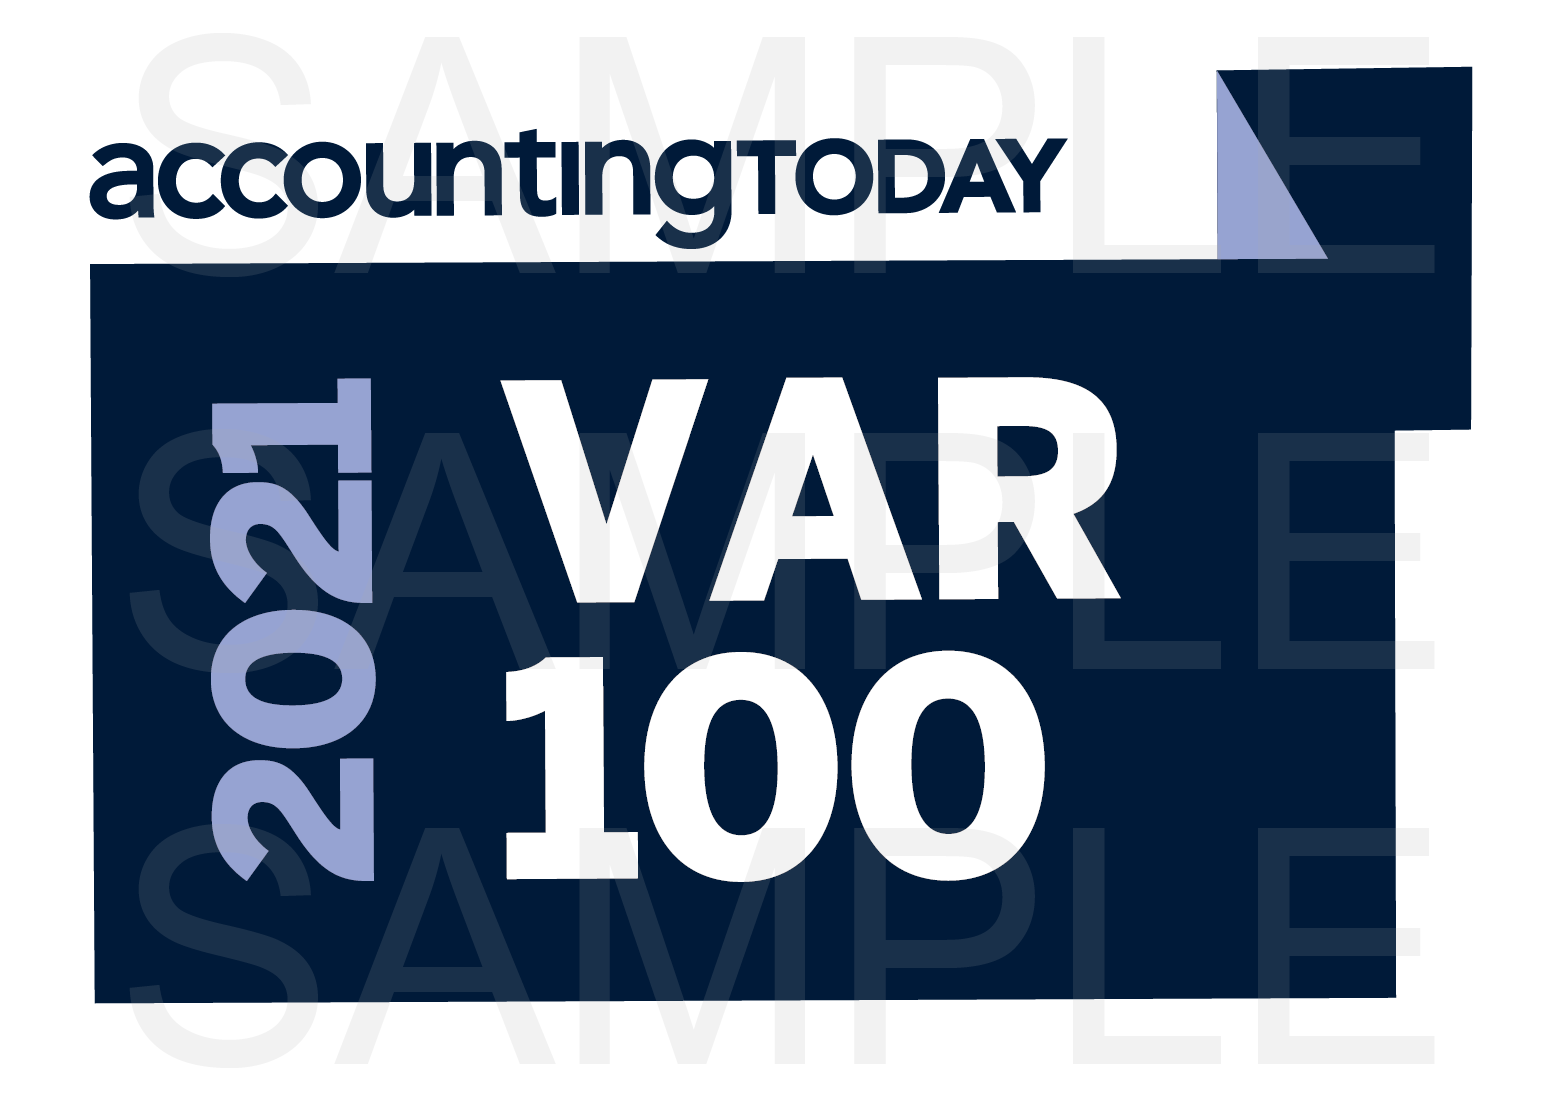 Accounting Today Var 100 2021 award